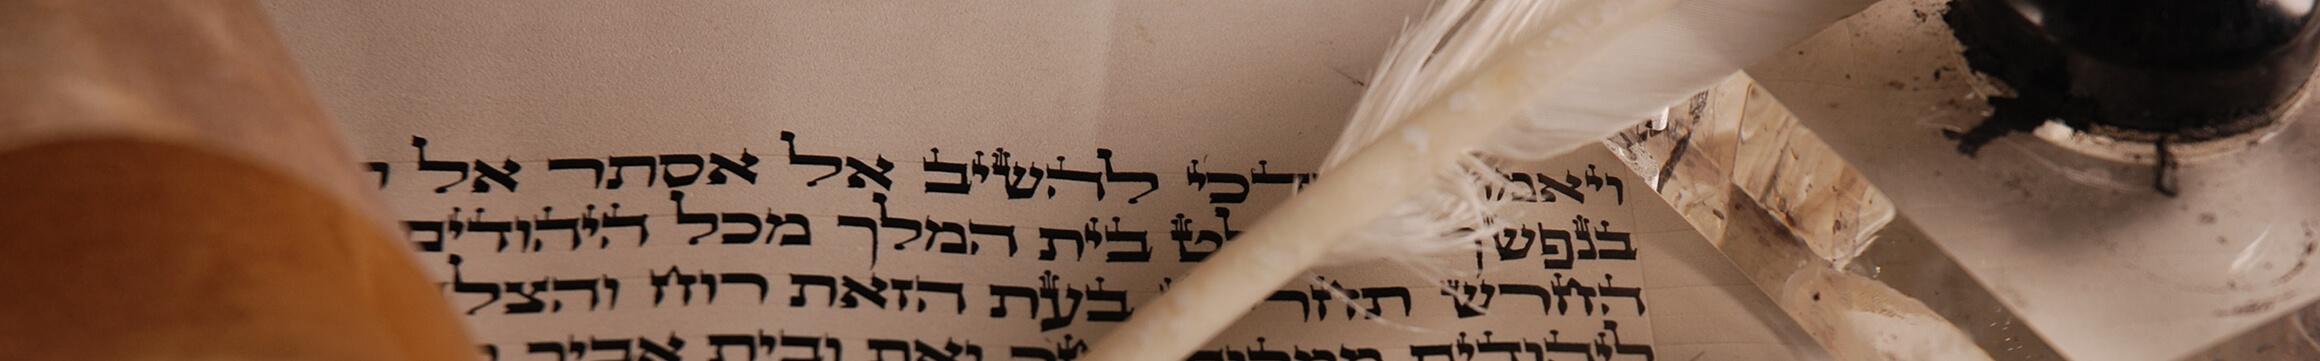 Jewish 06